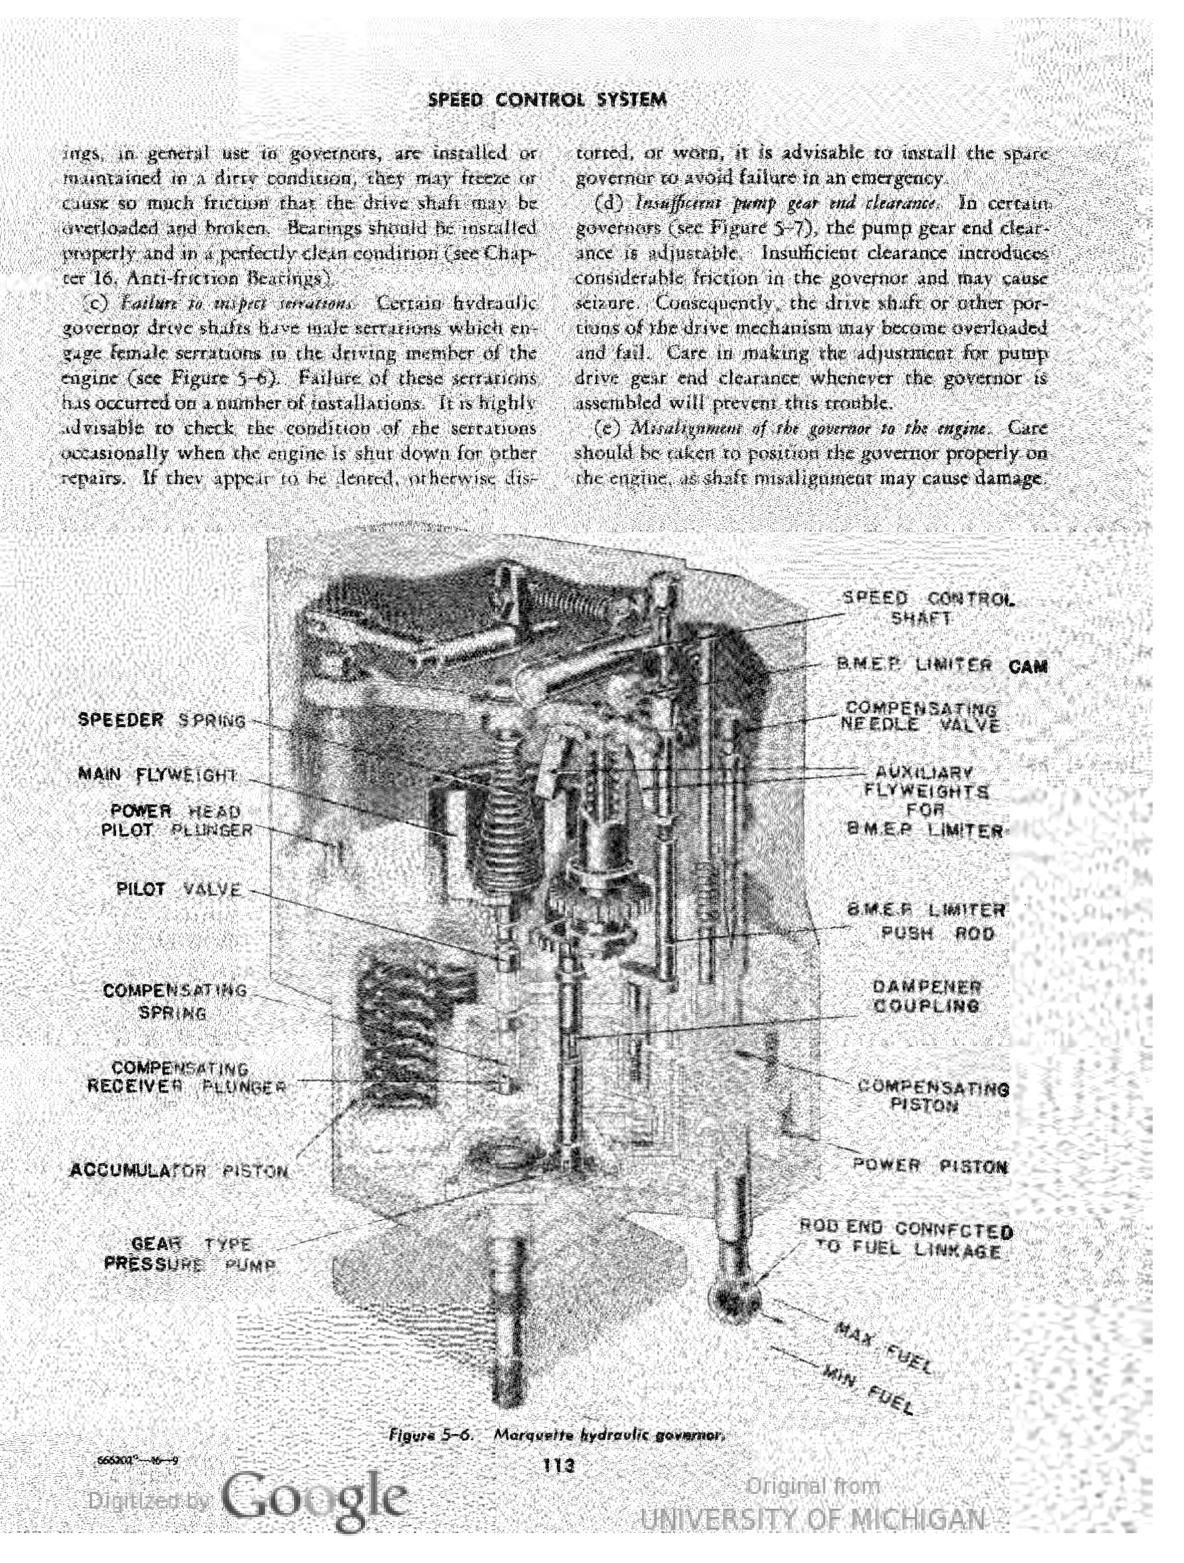 User Guide · Train · Diesel Engine Maintenance Training Manual Diesel Engine,  Manual, Engineering, Trains, Textbook,